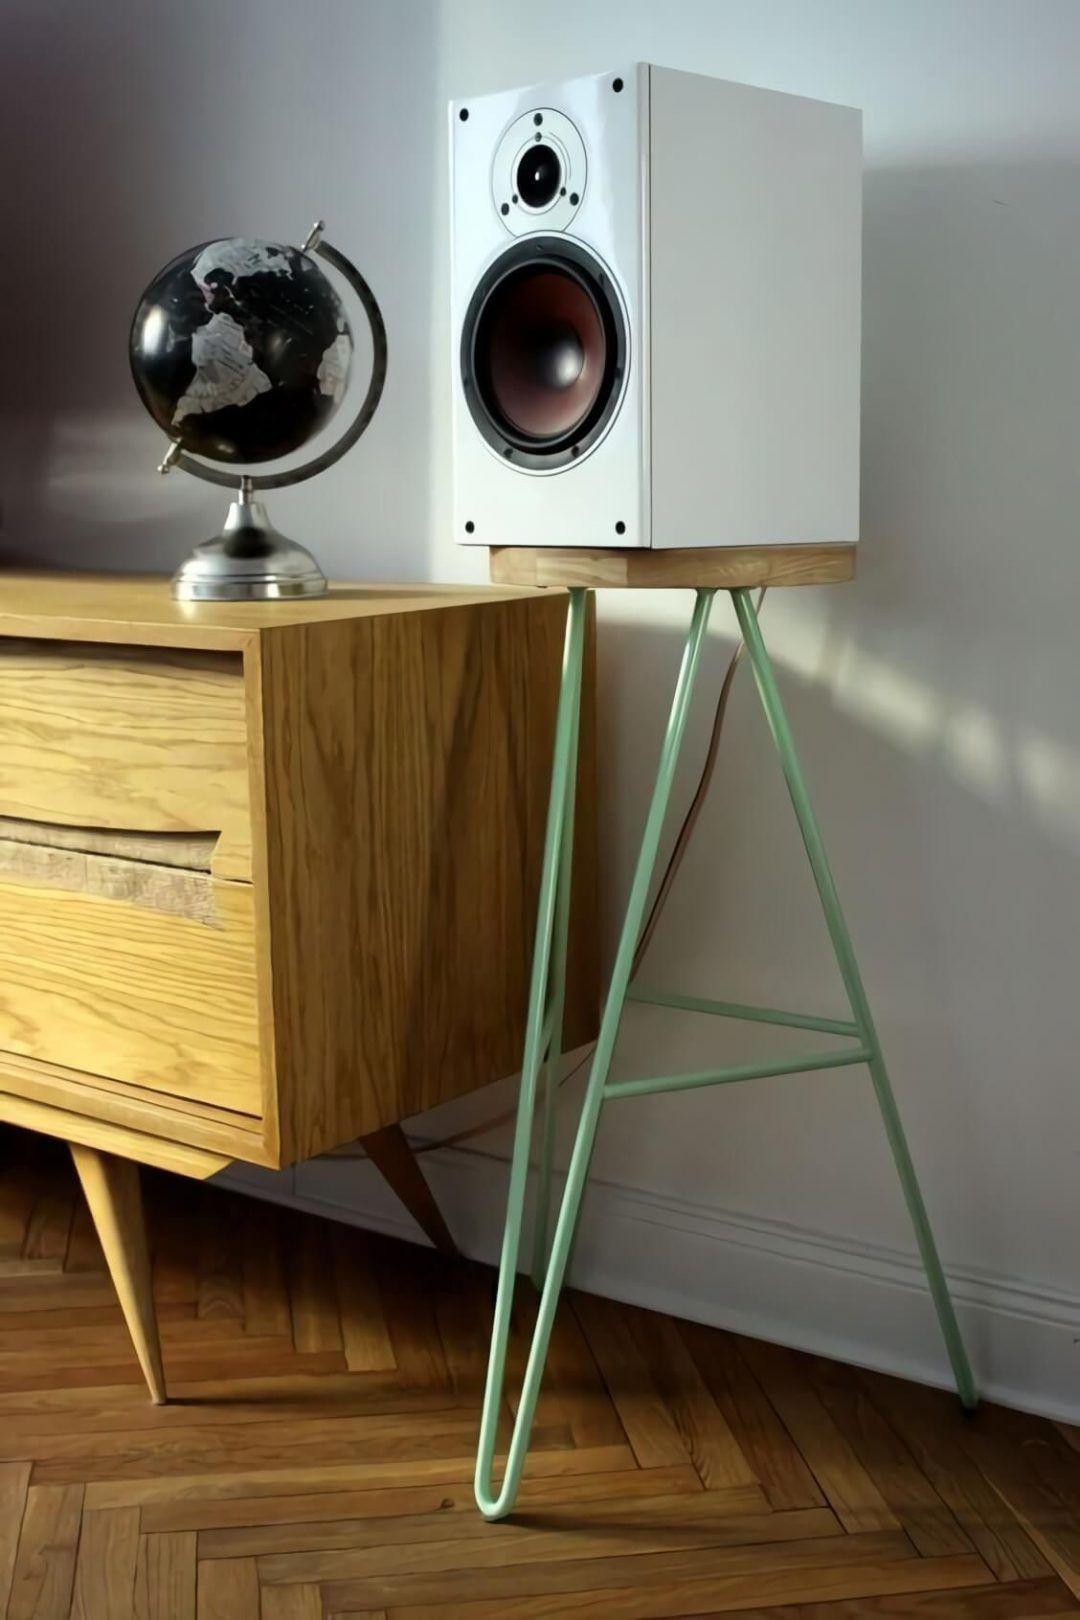 11 Diy Speaker Stand To Get A Perfect Sound Experience - B3Dc71C14F9C17Bb53Db94826565B658